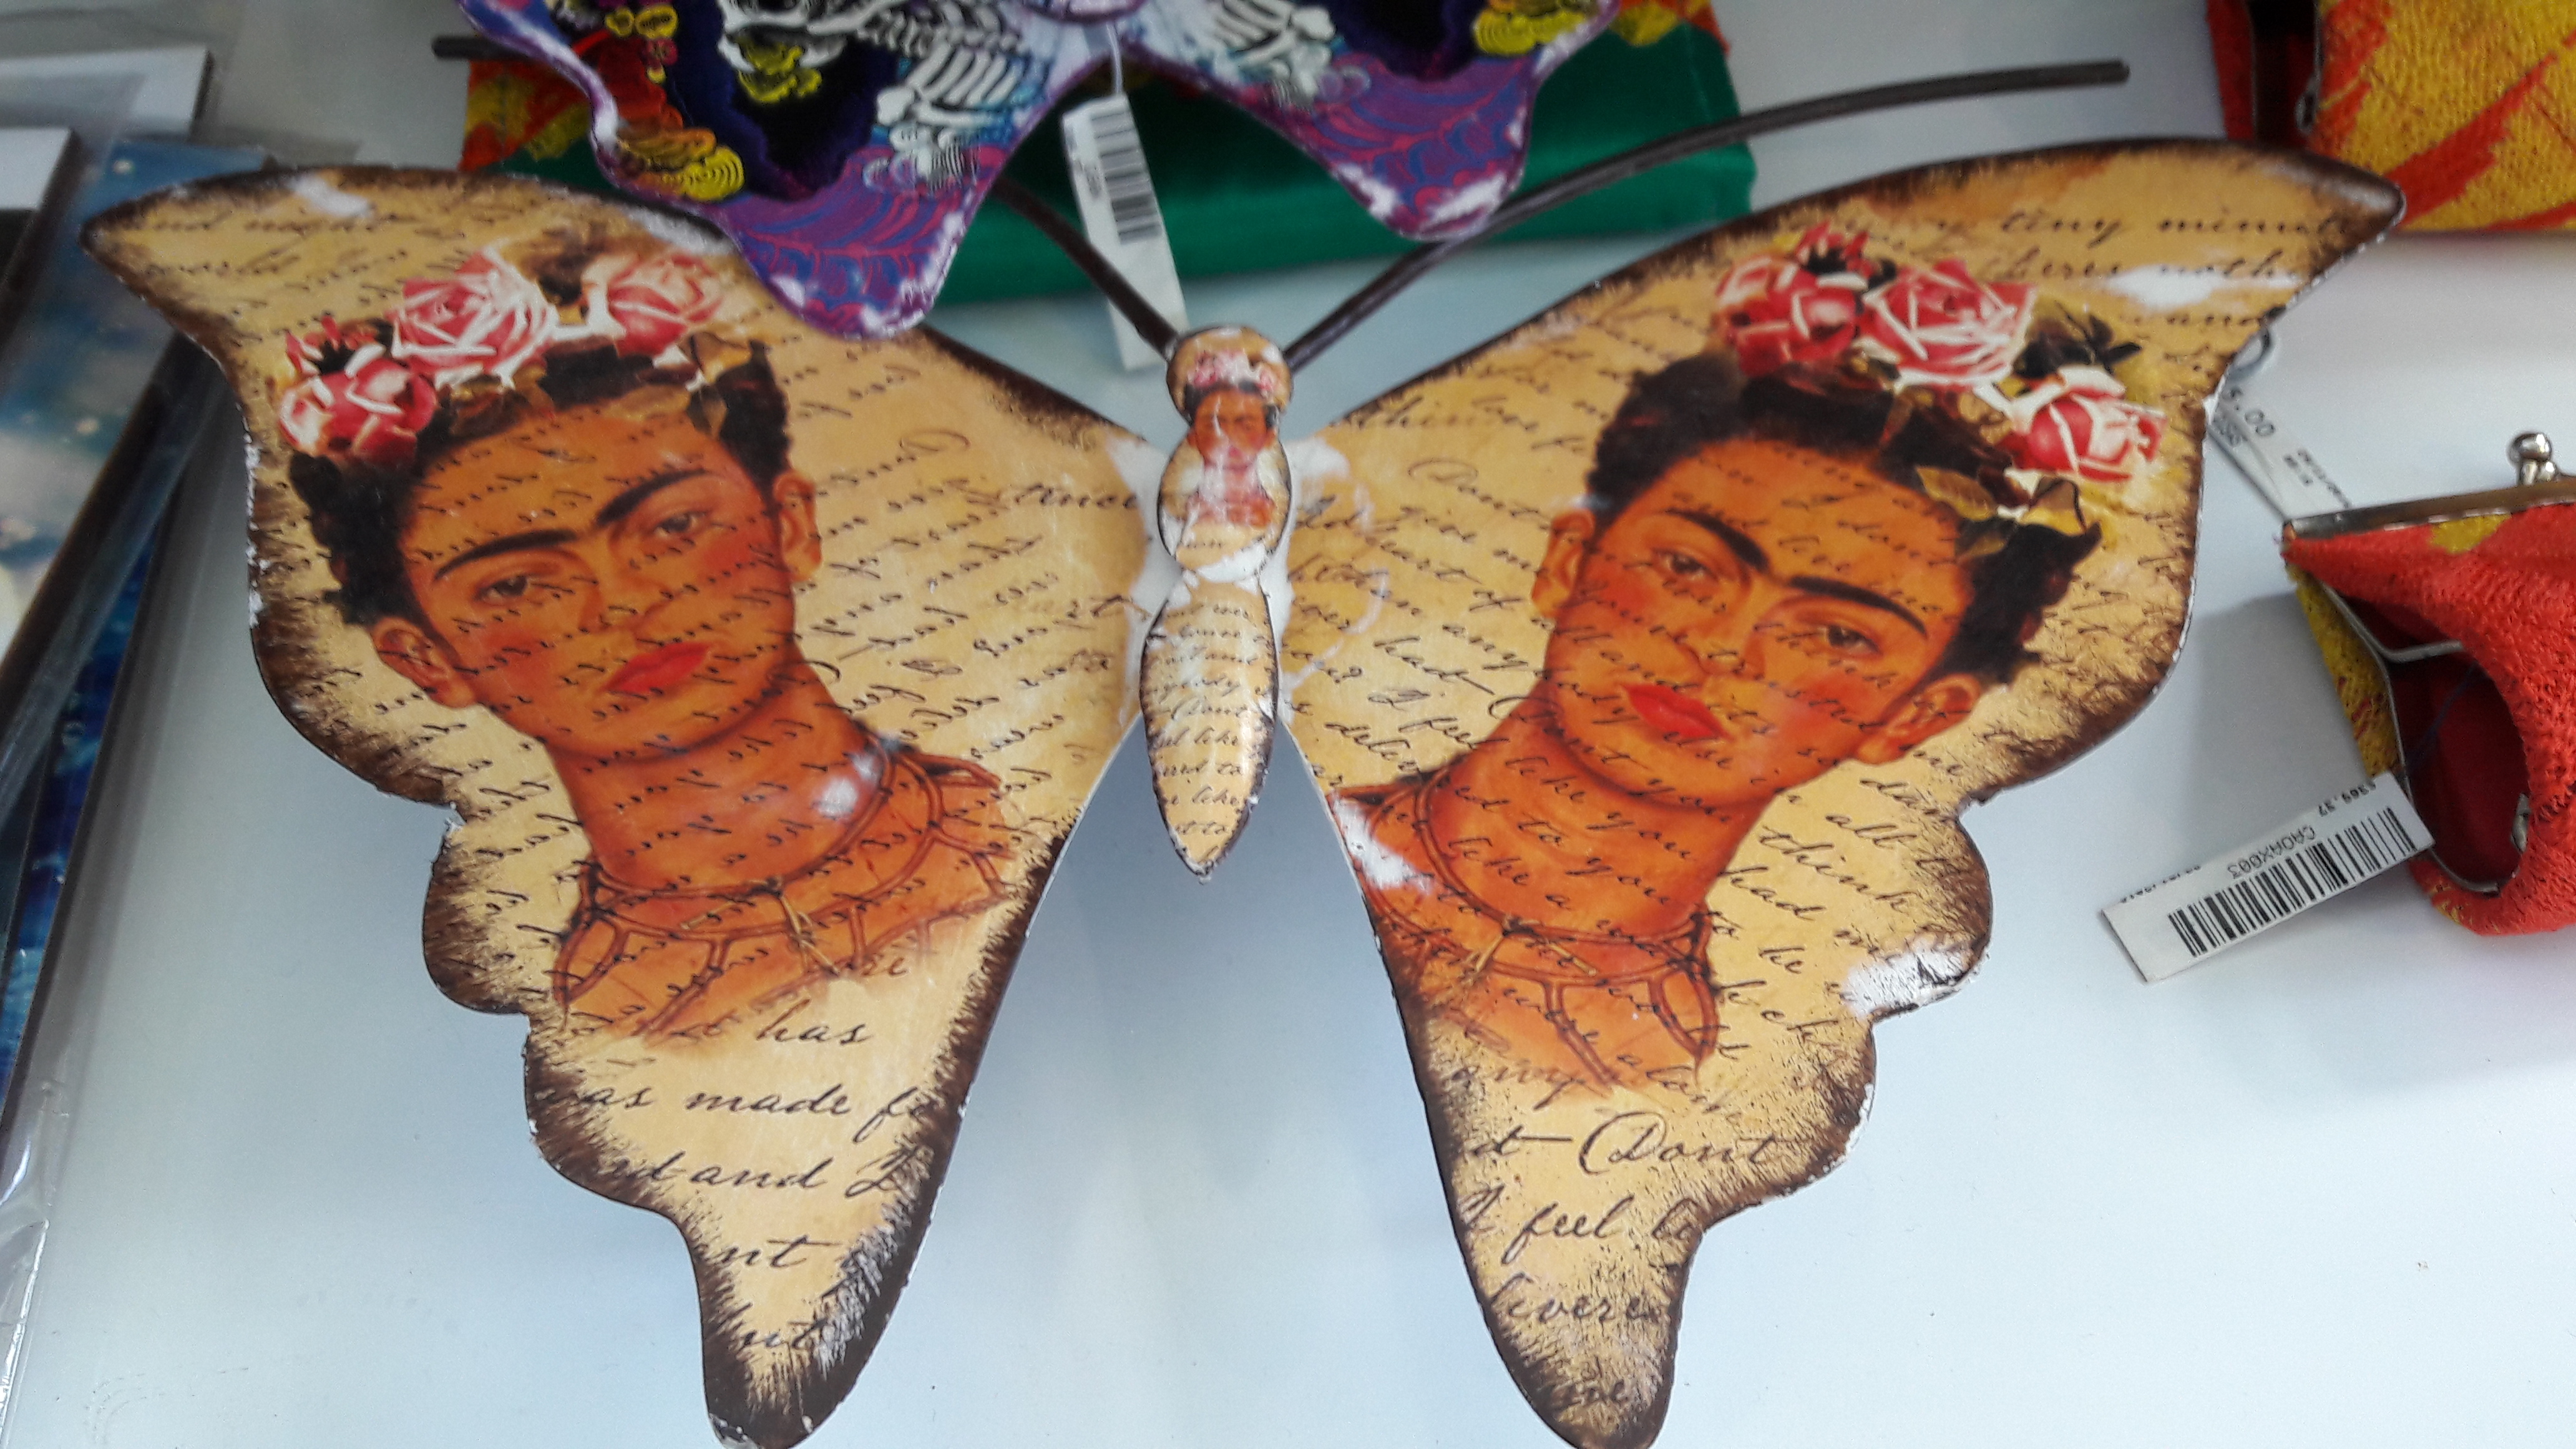 Frida Kahlo Discover Mexico giftshop